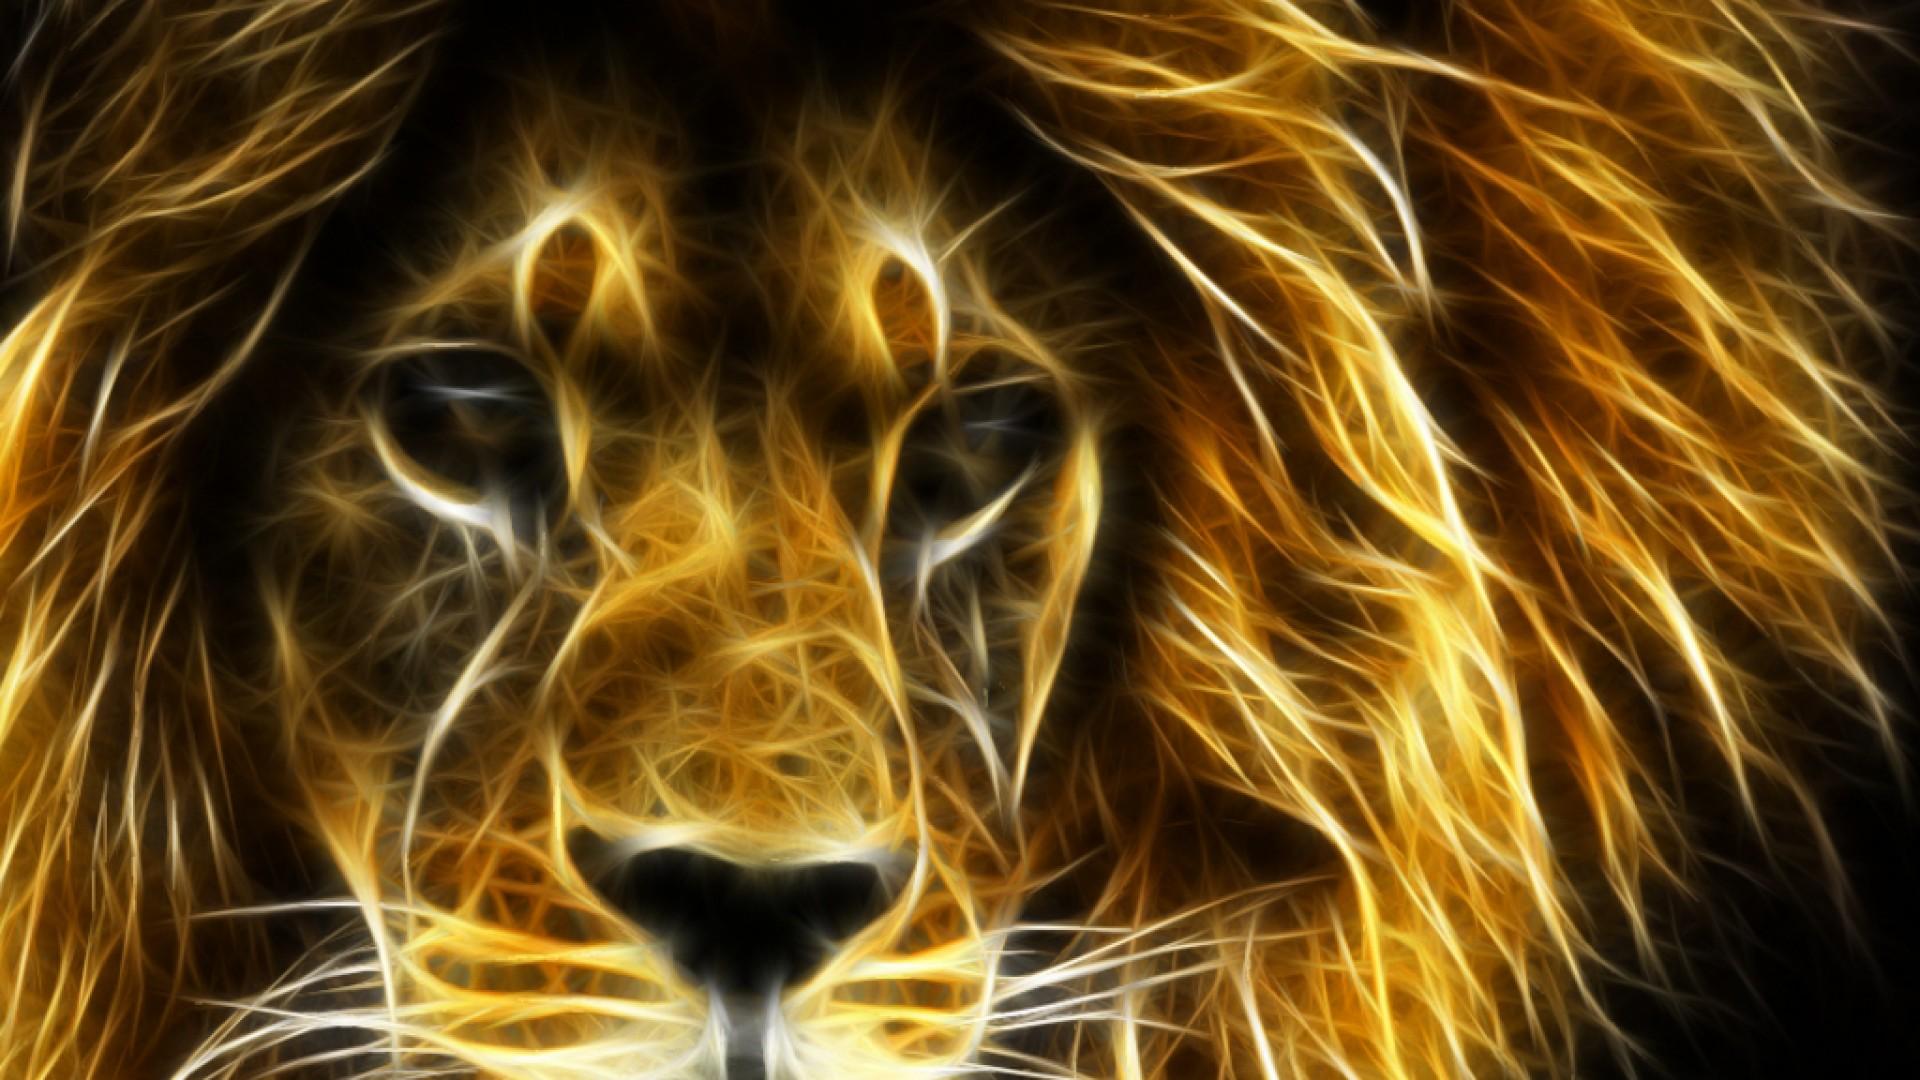 Lion Wallpaper Hd 1080p Wallpapersafari